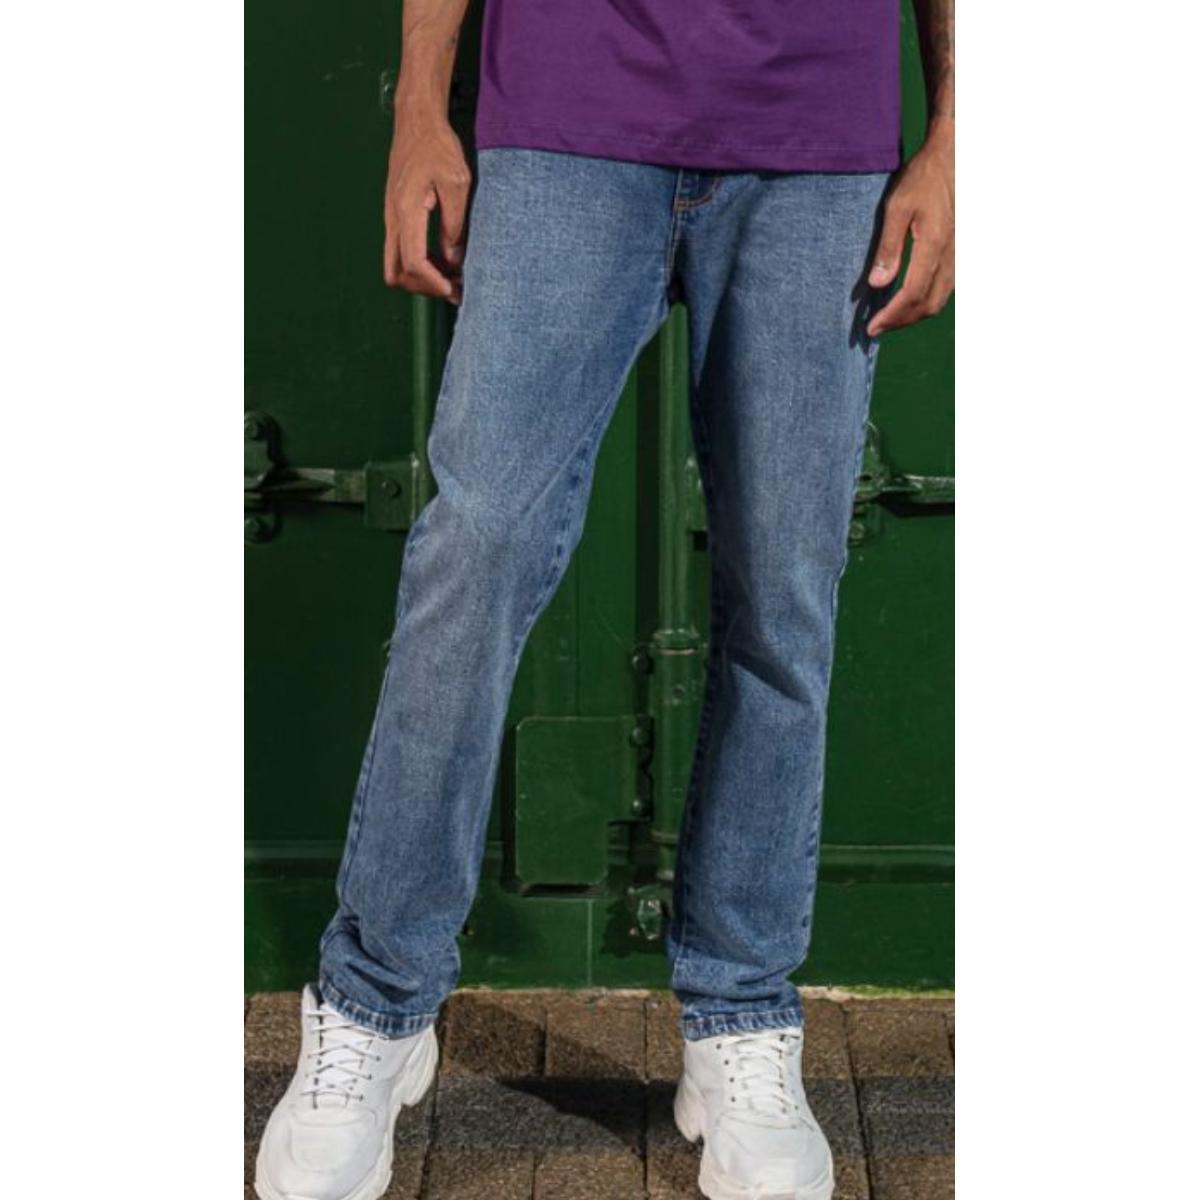 Calça Masculina Coca-cola Clothing 13202778  Jeans